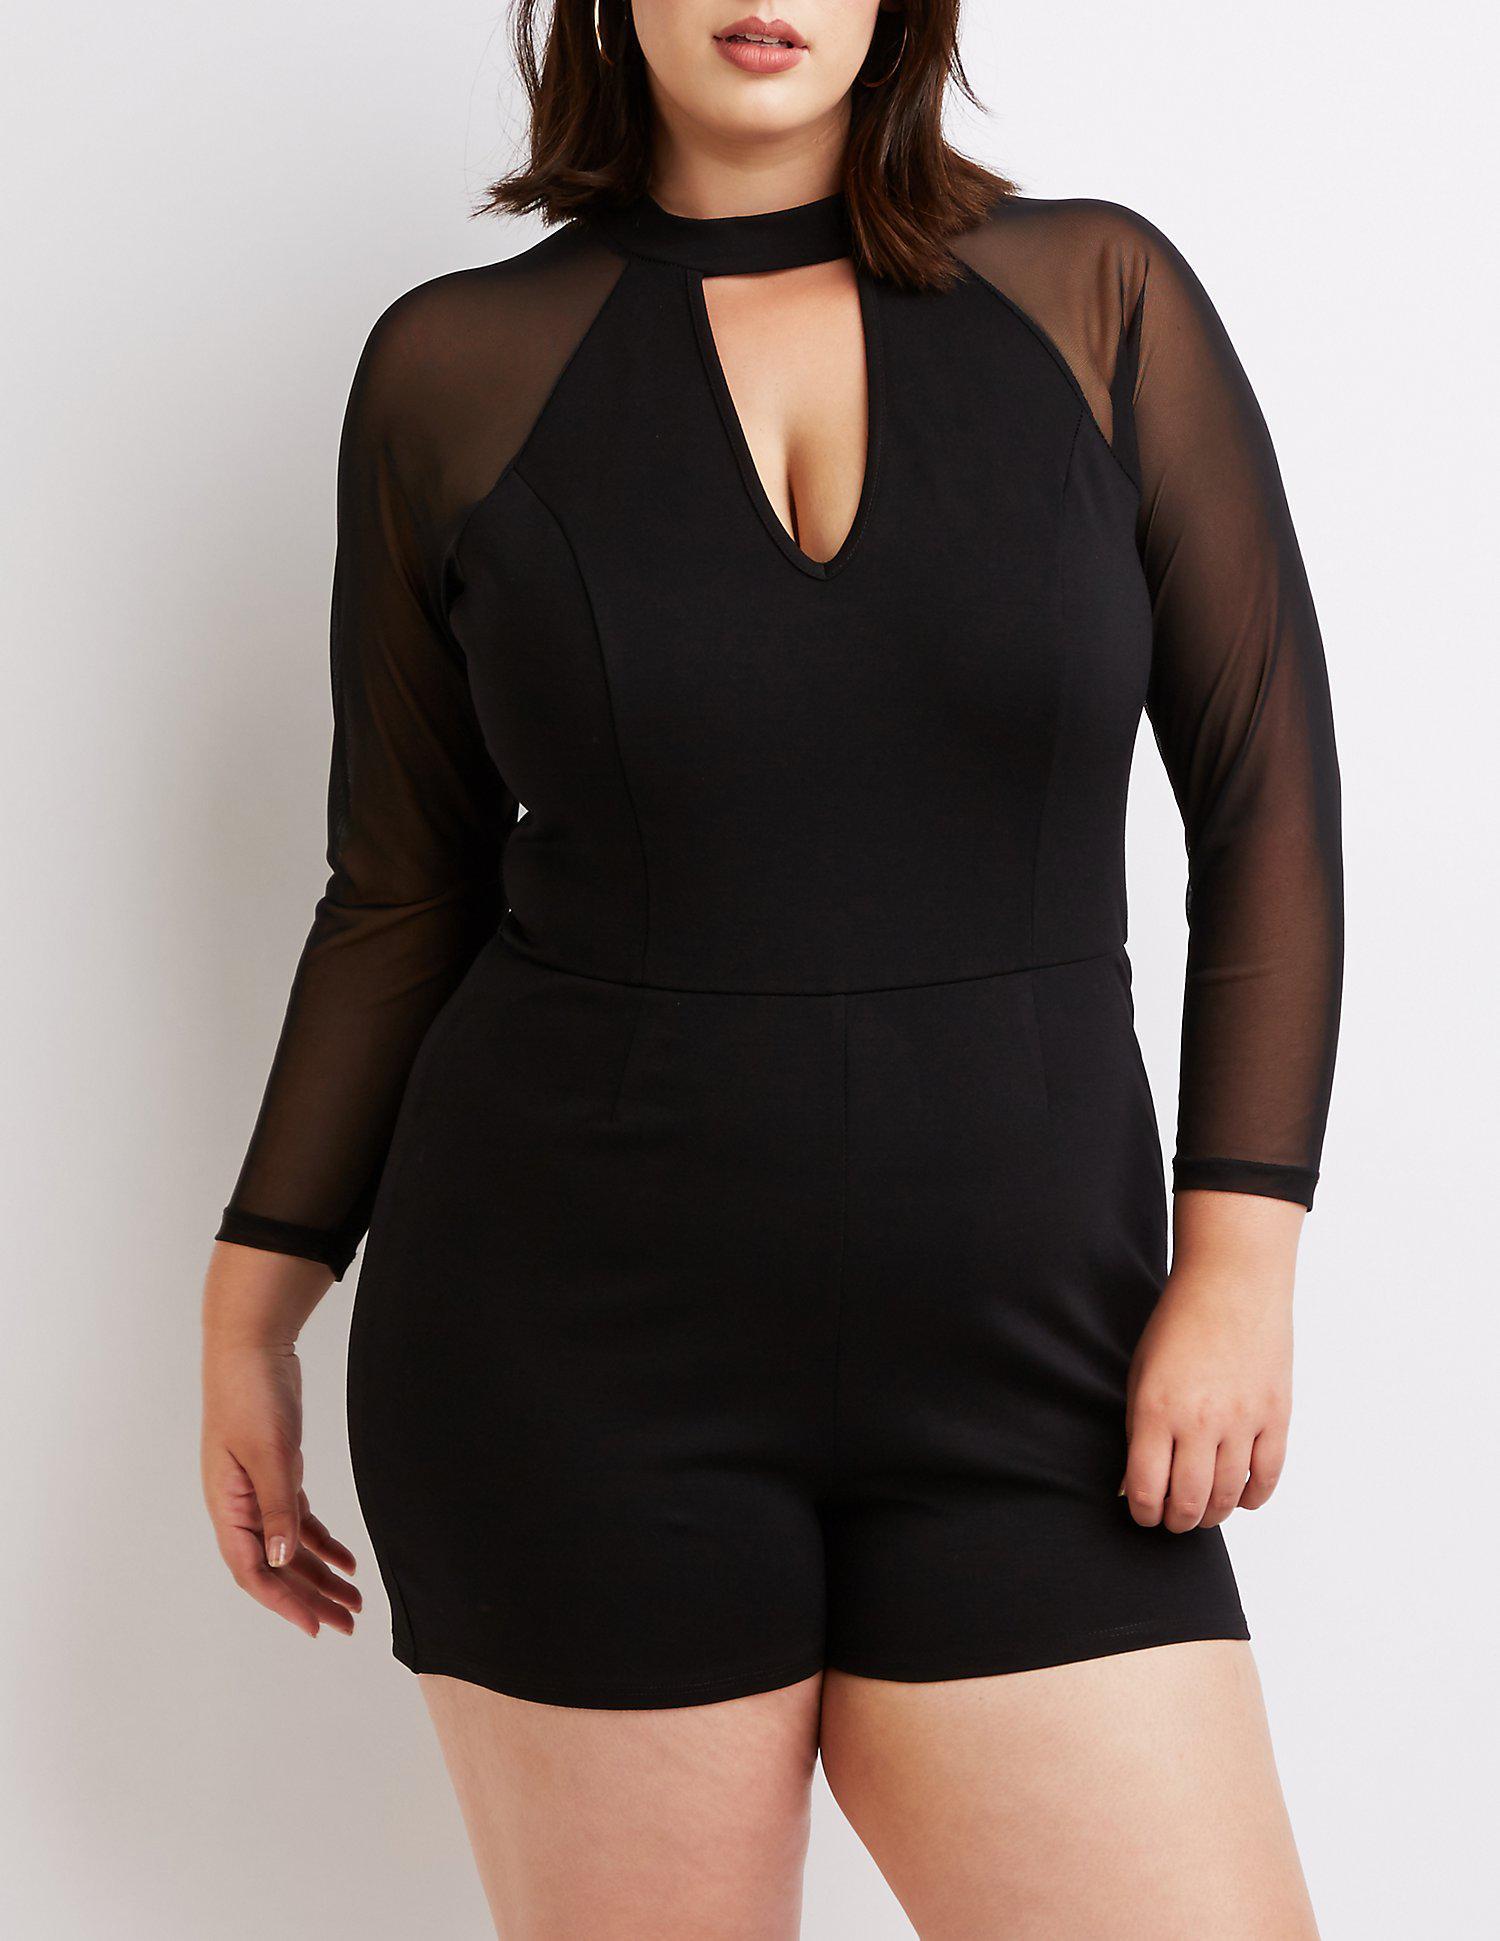 d38d33197c26 Lyst - Charlotte Russe Plus Size Mesh Sleeve Cut-out Romper in Black